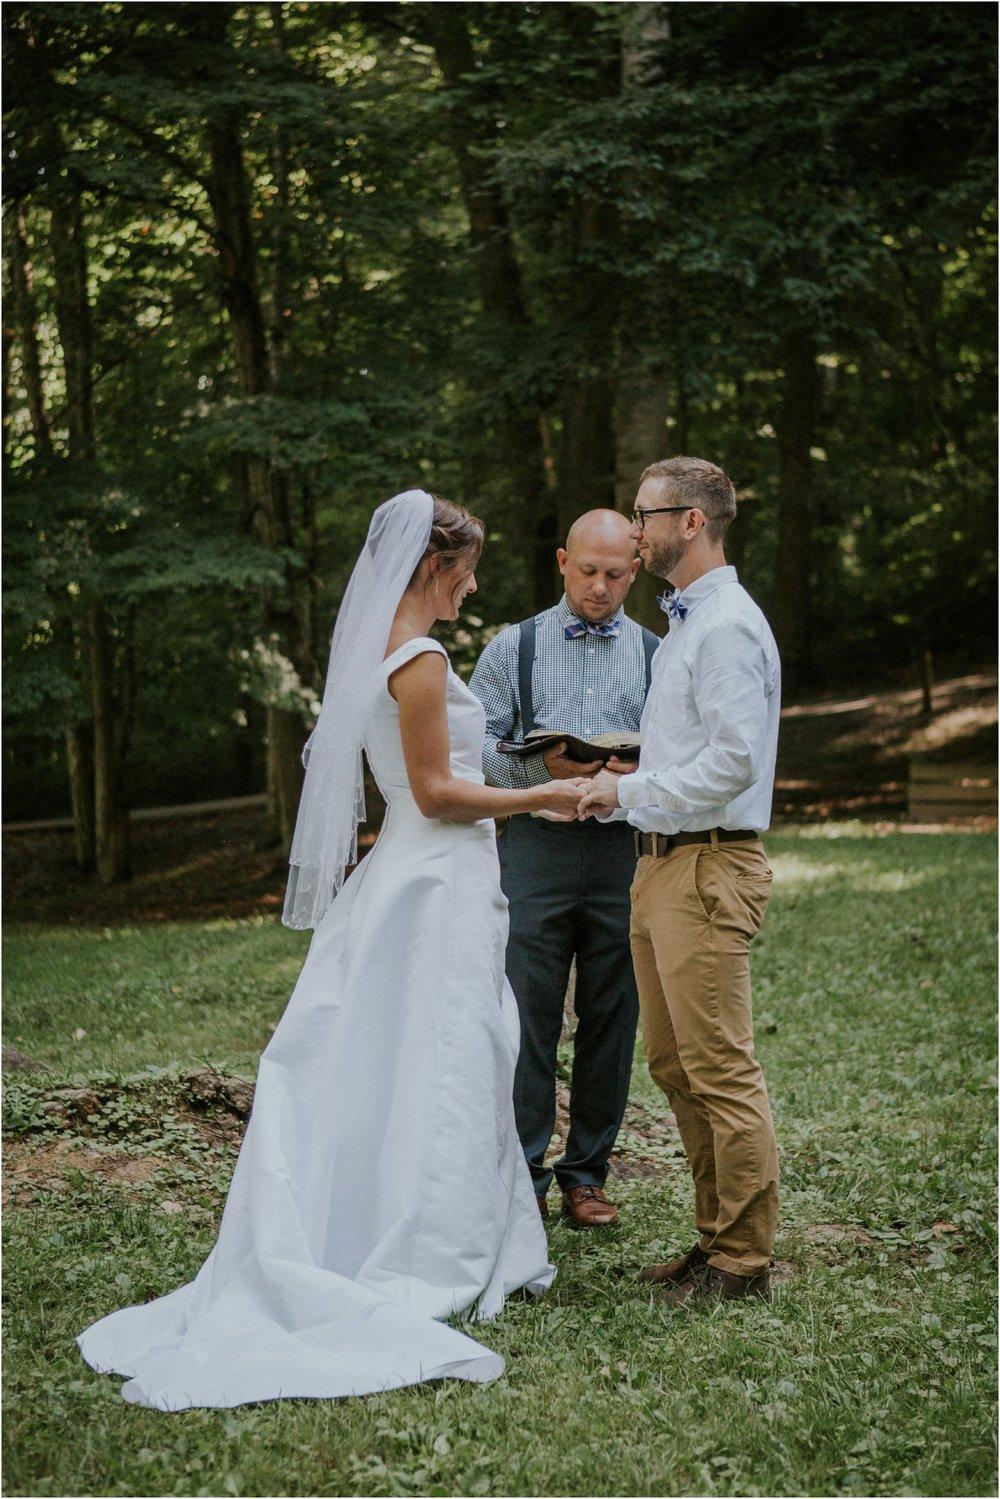 sugar-hollow-park-bristol-virginia-wedding-intimate-woodsy-black-forest-ceremony-adventurous-couple_0021.jpg